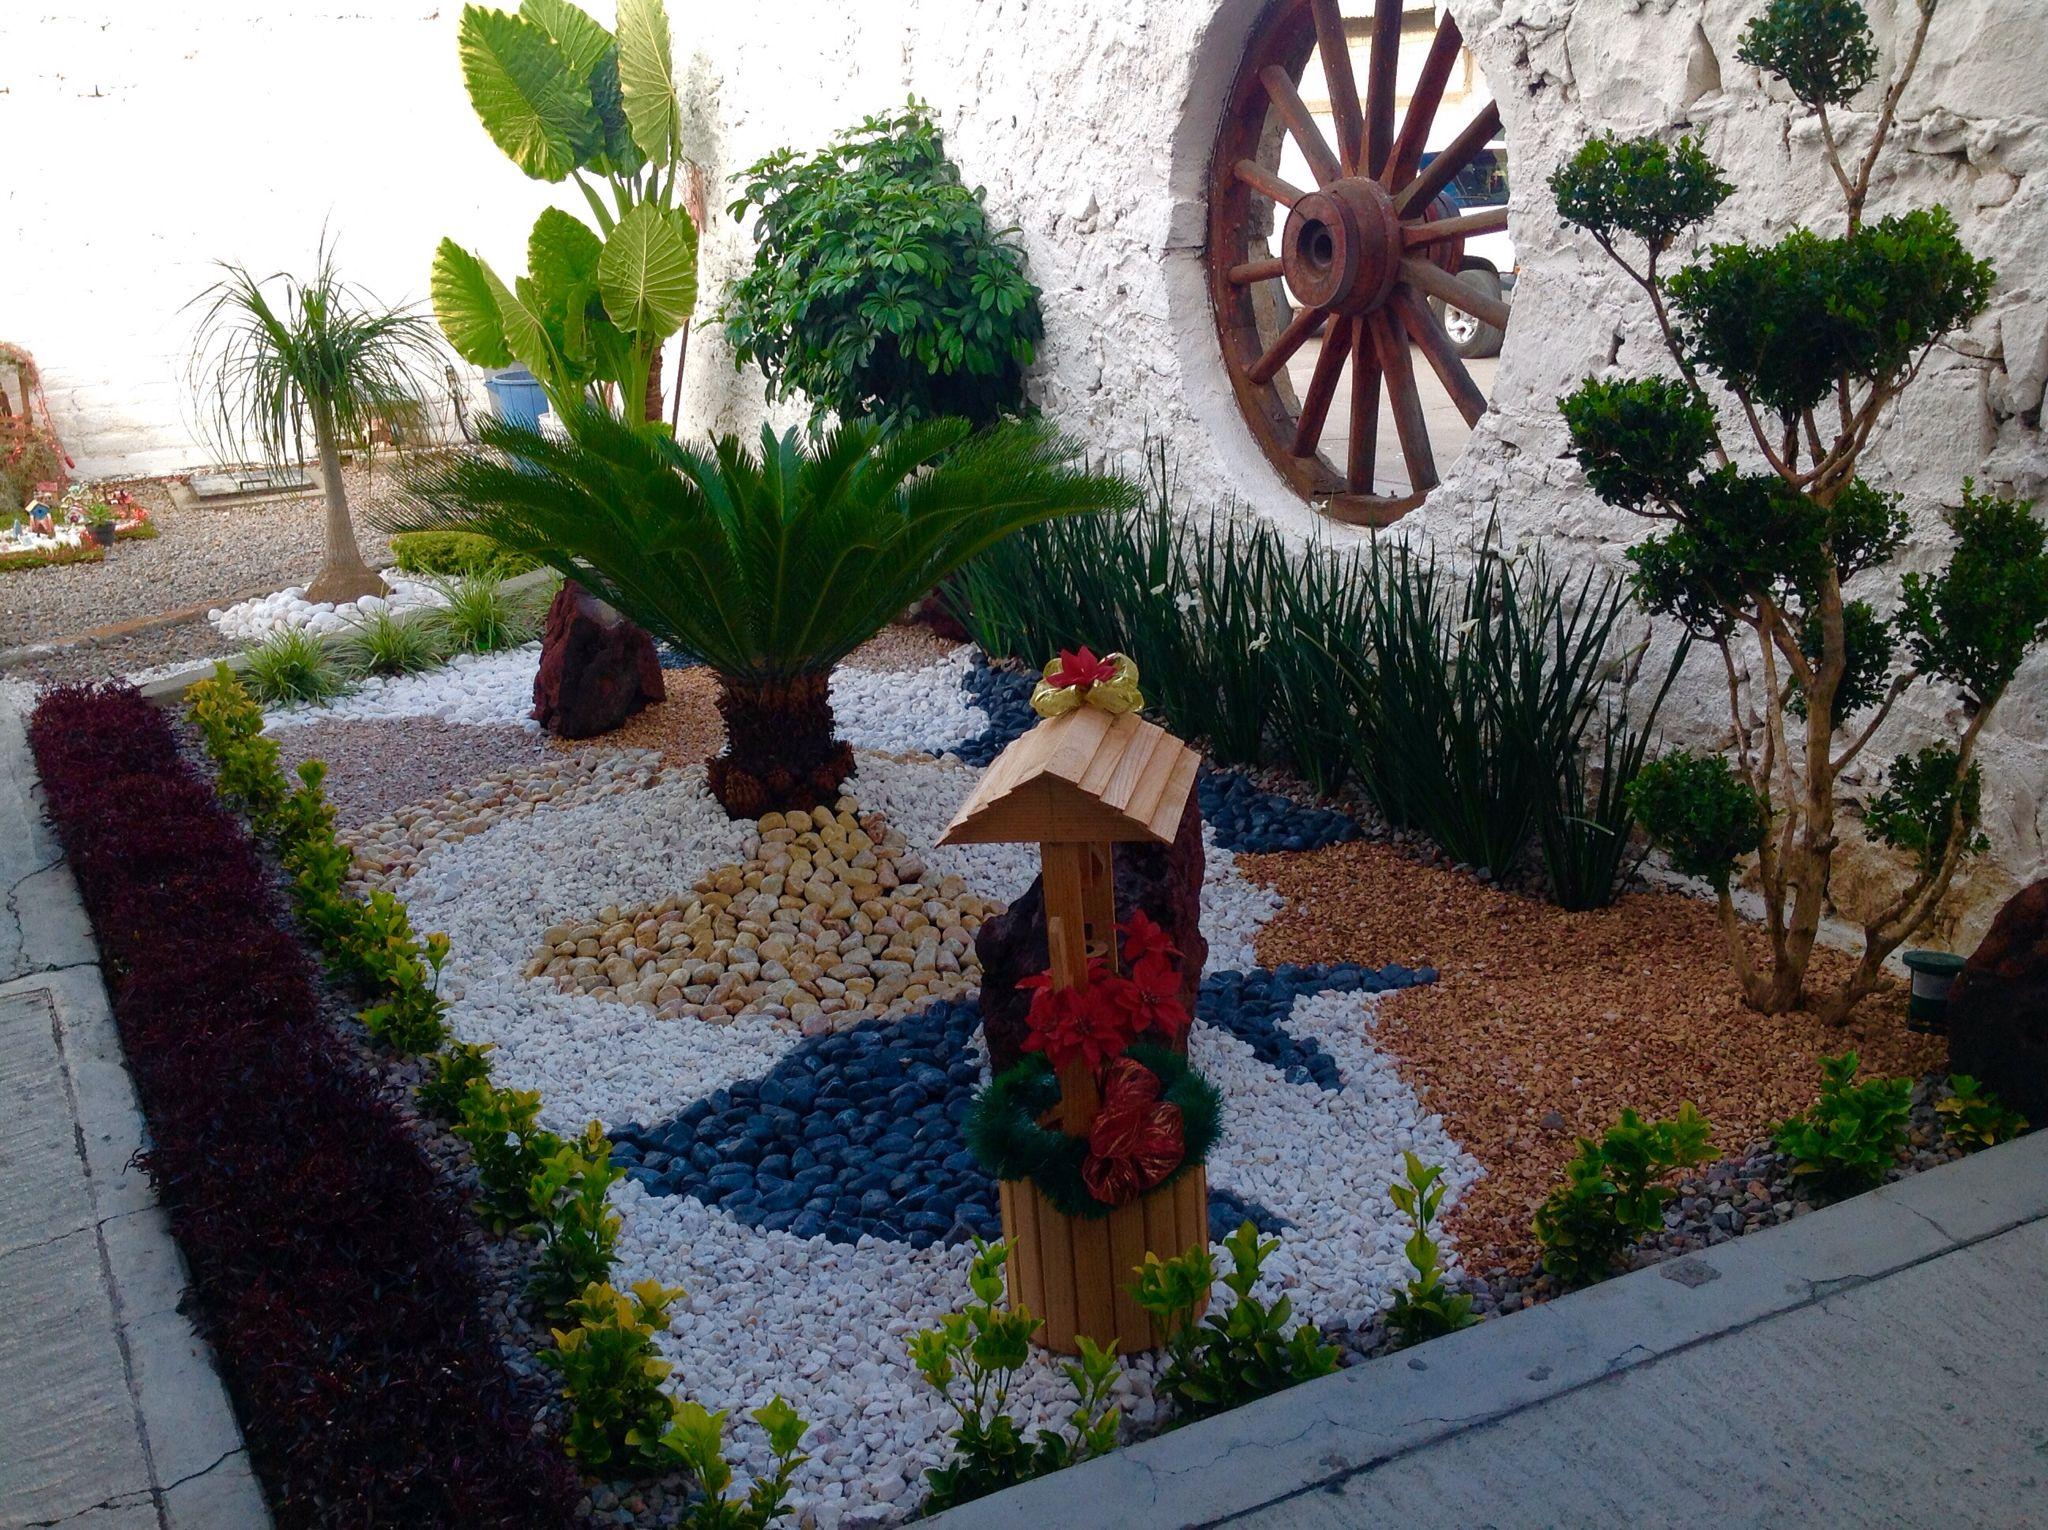 Decoraci n con piedra decoraci n de jardines pinterest - Piedras decoracion jardin ...